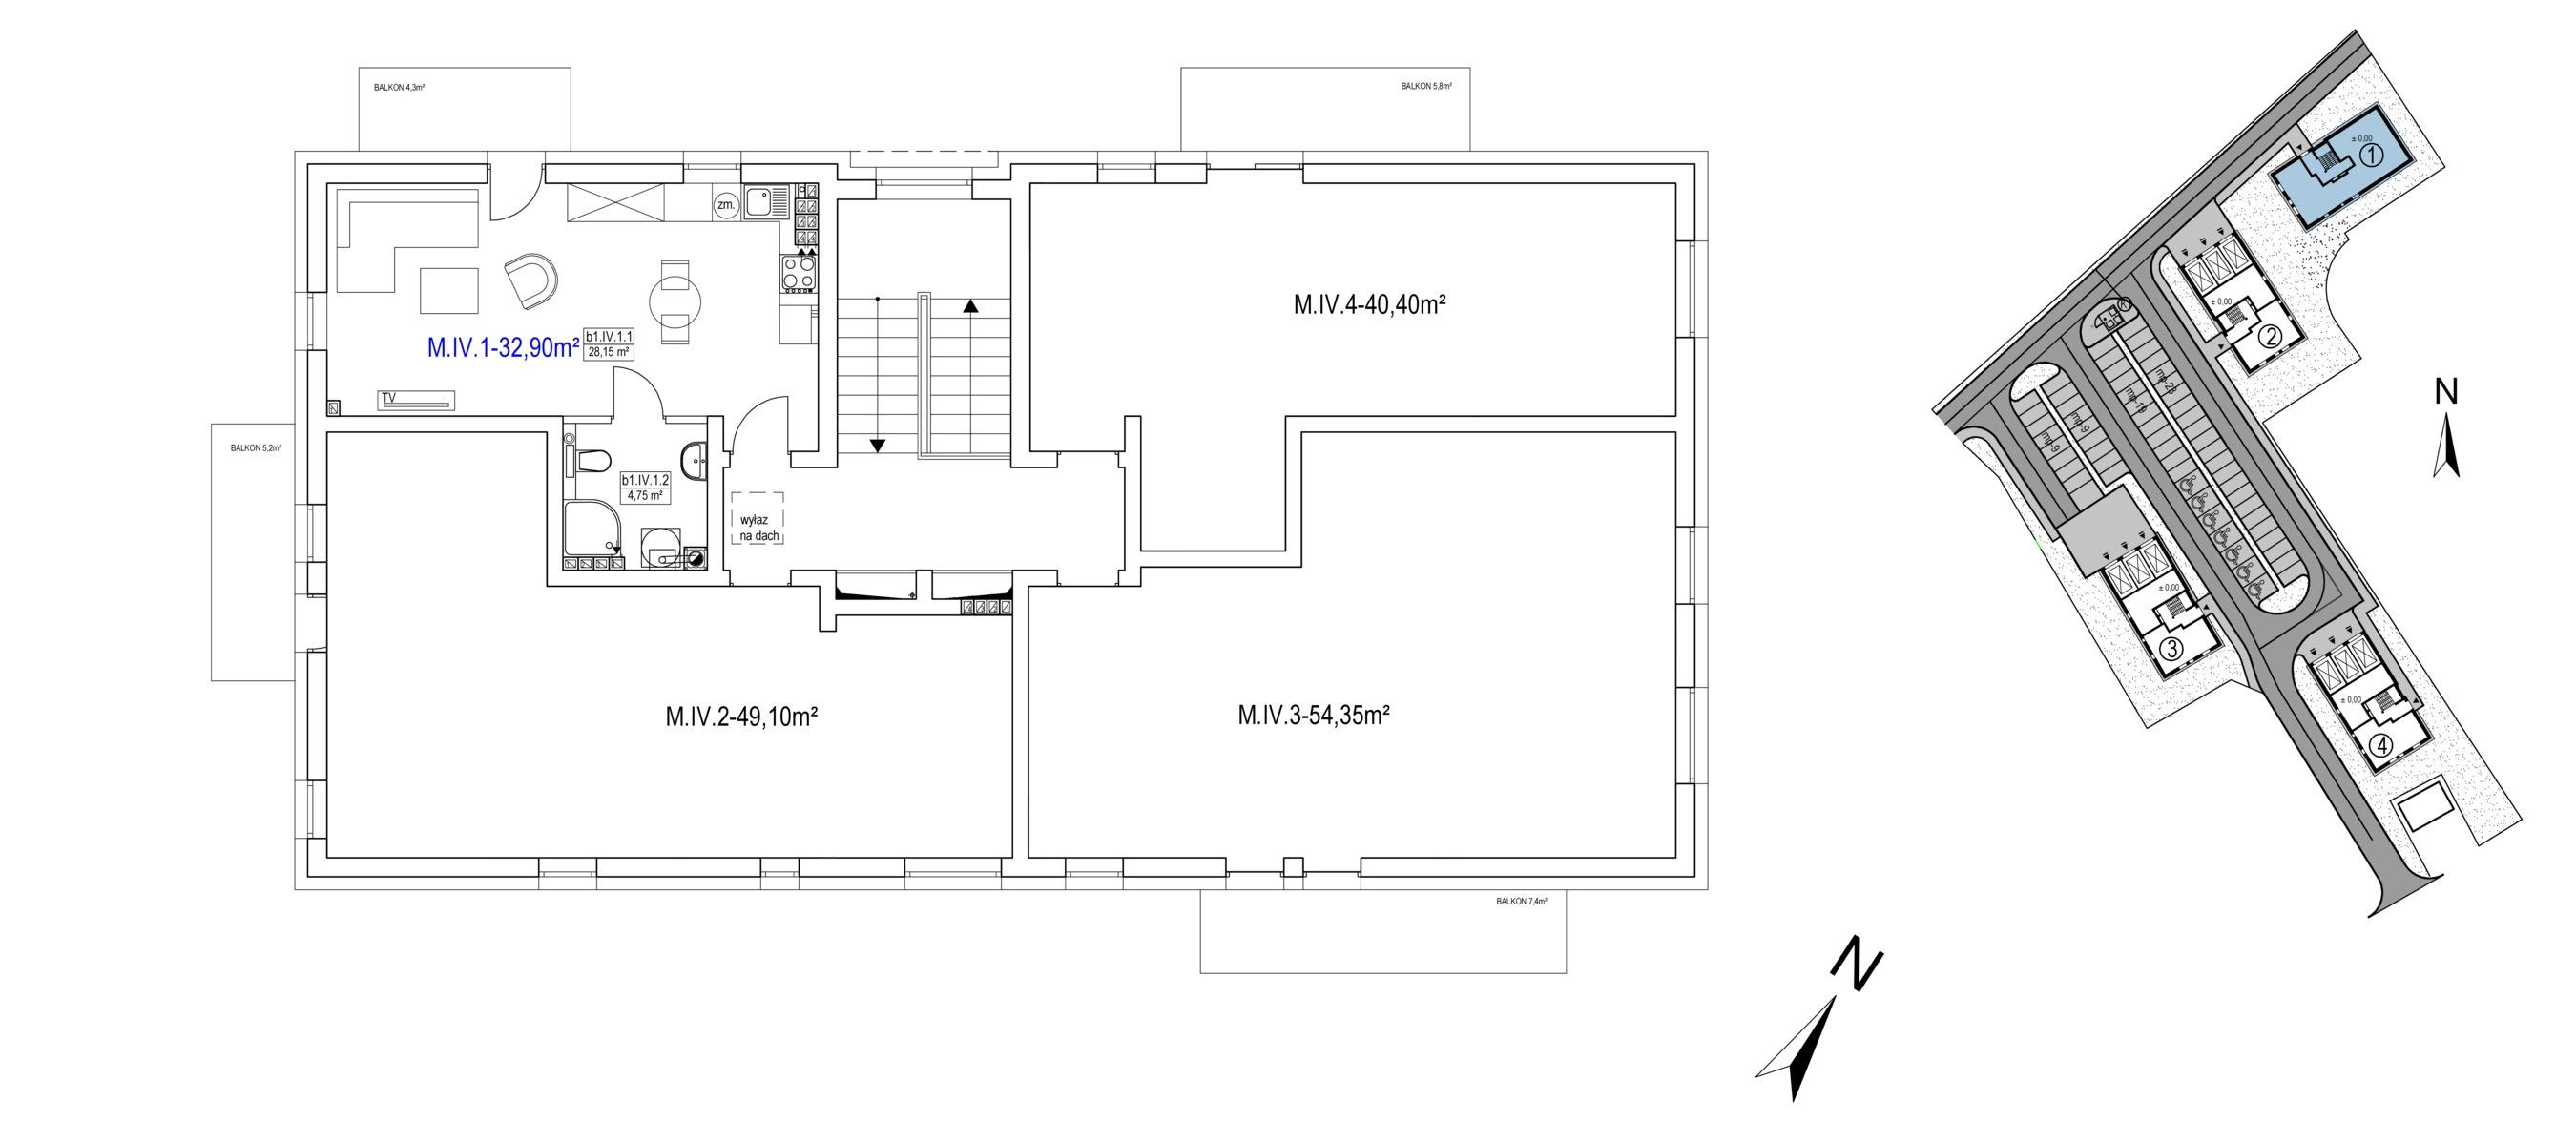 /assets/img/flats/B1.M.IV.1.jpg